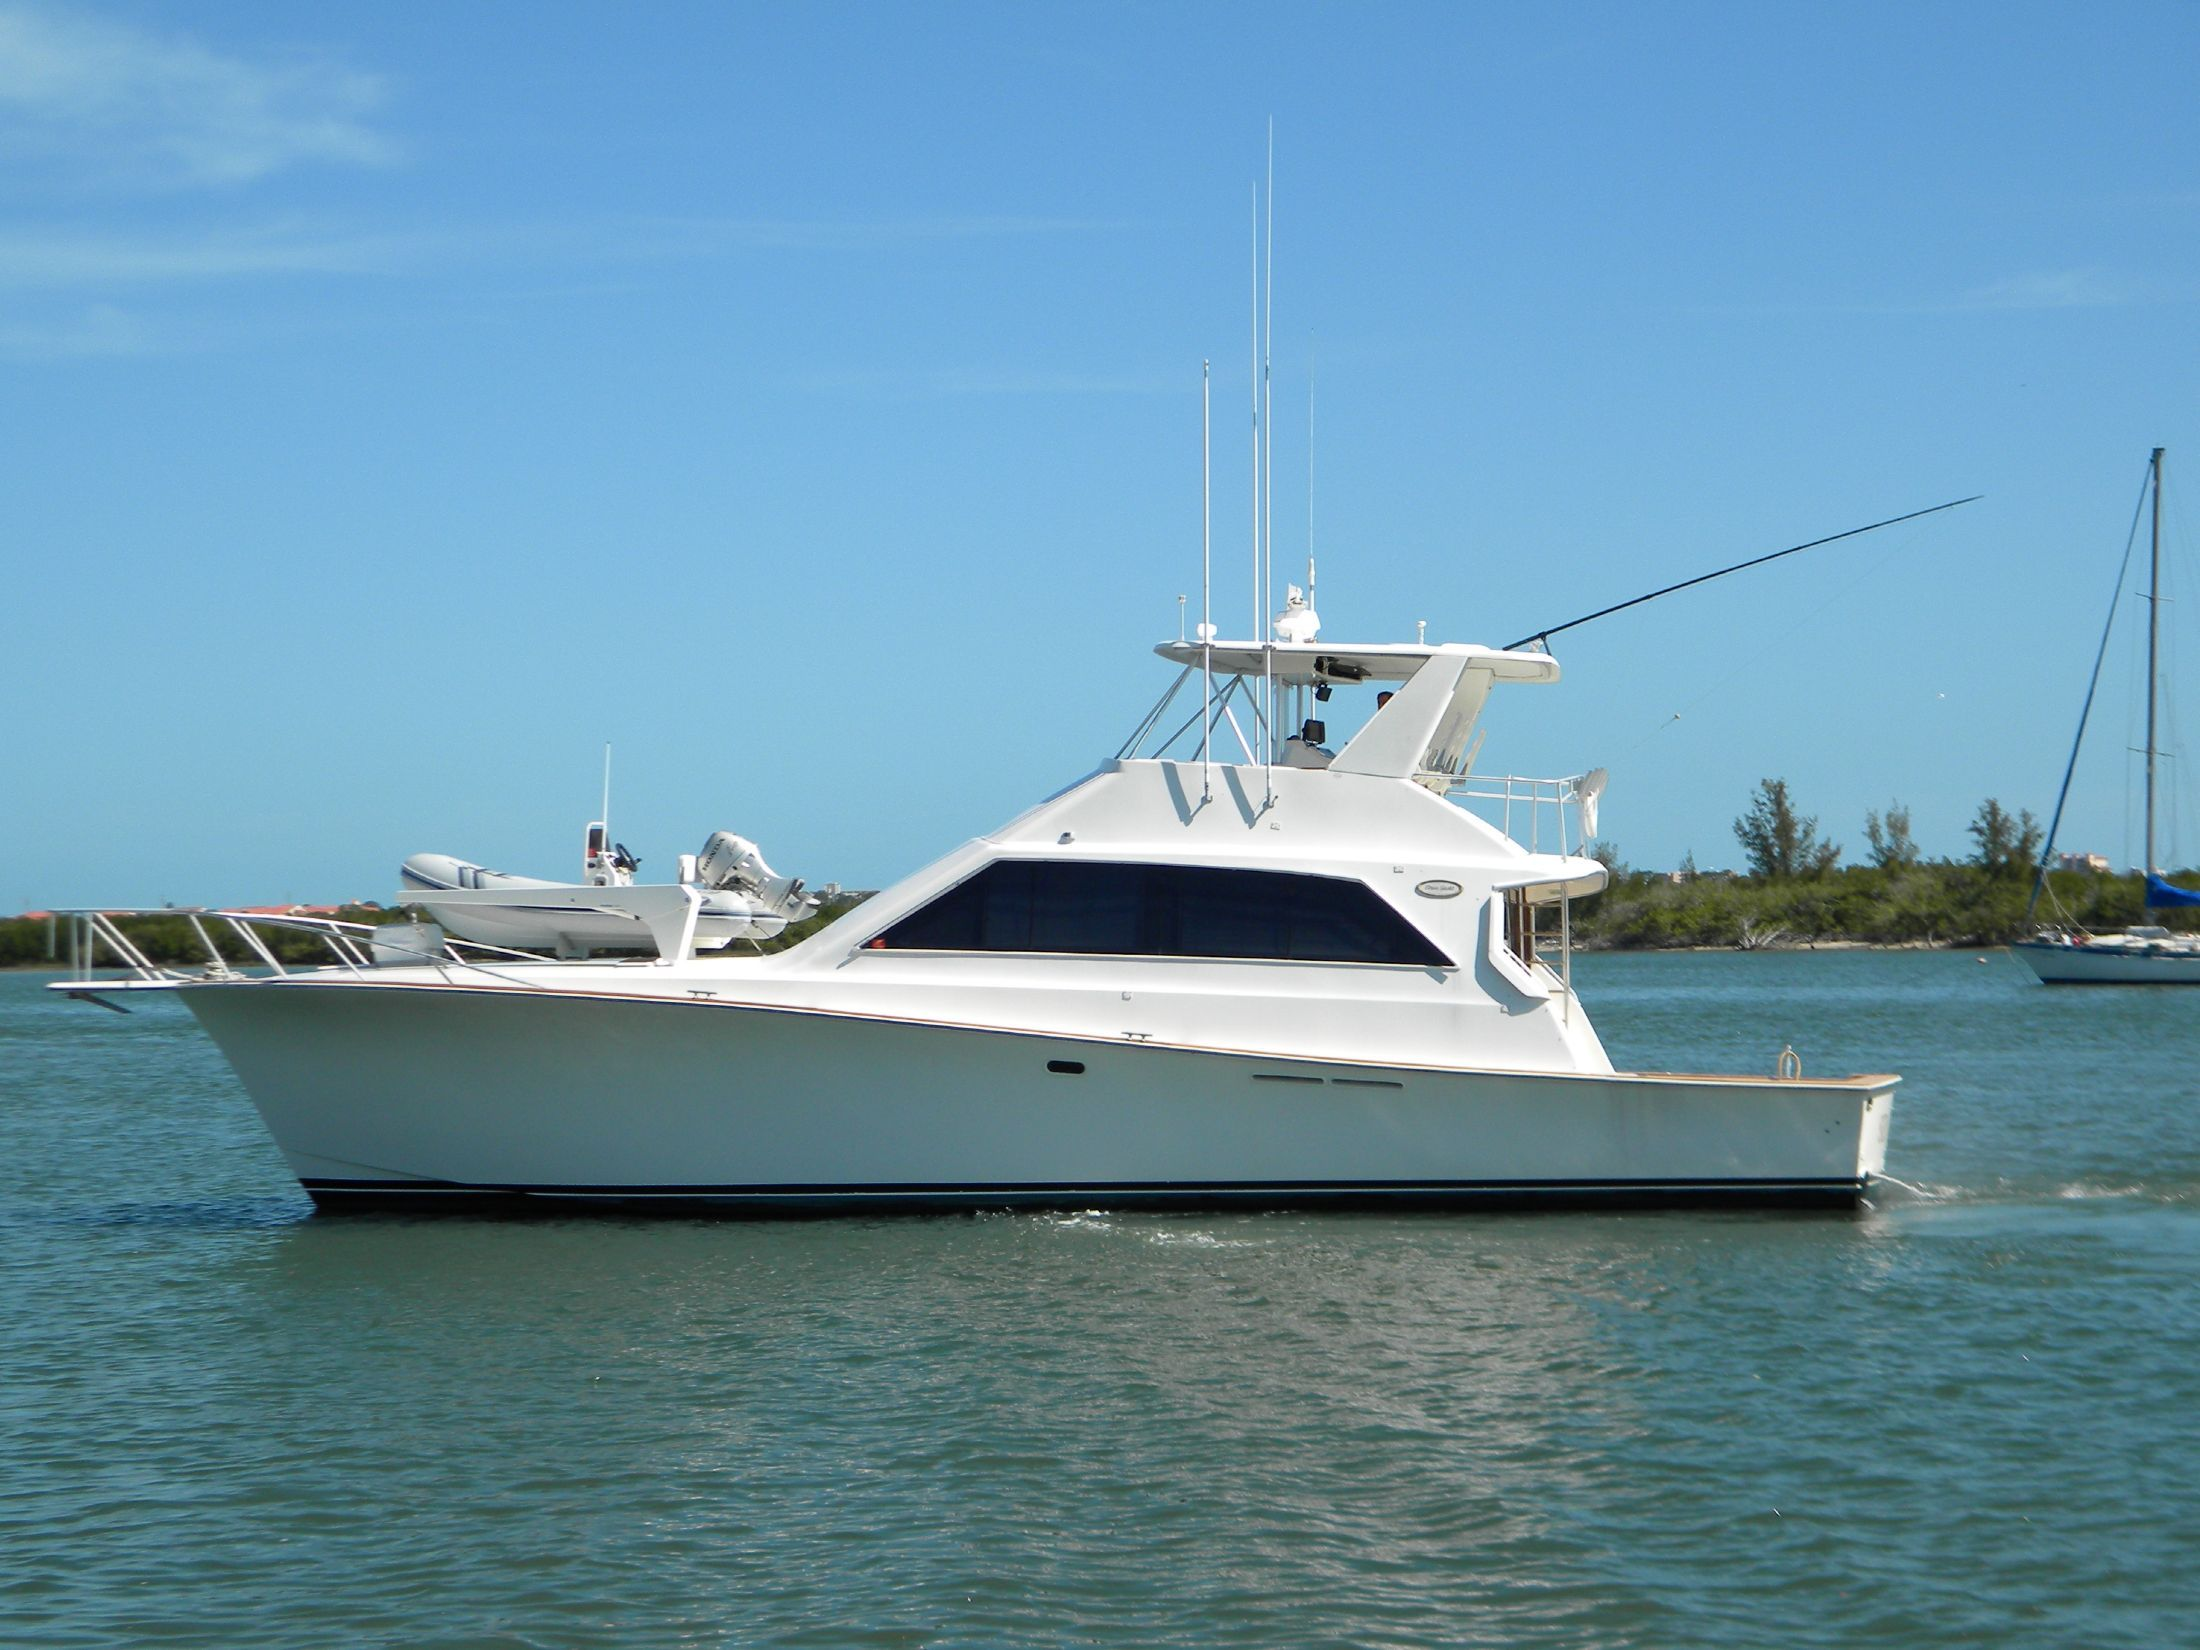 Boat Dealers Daytona Beach Fl